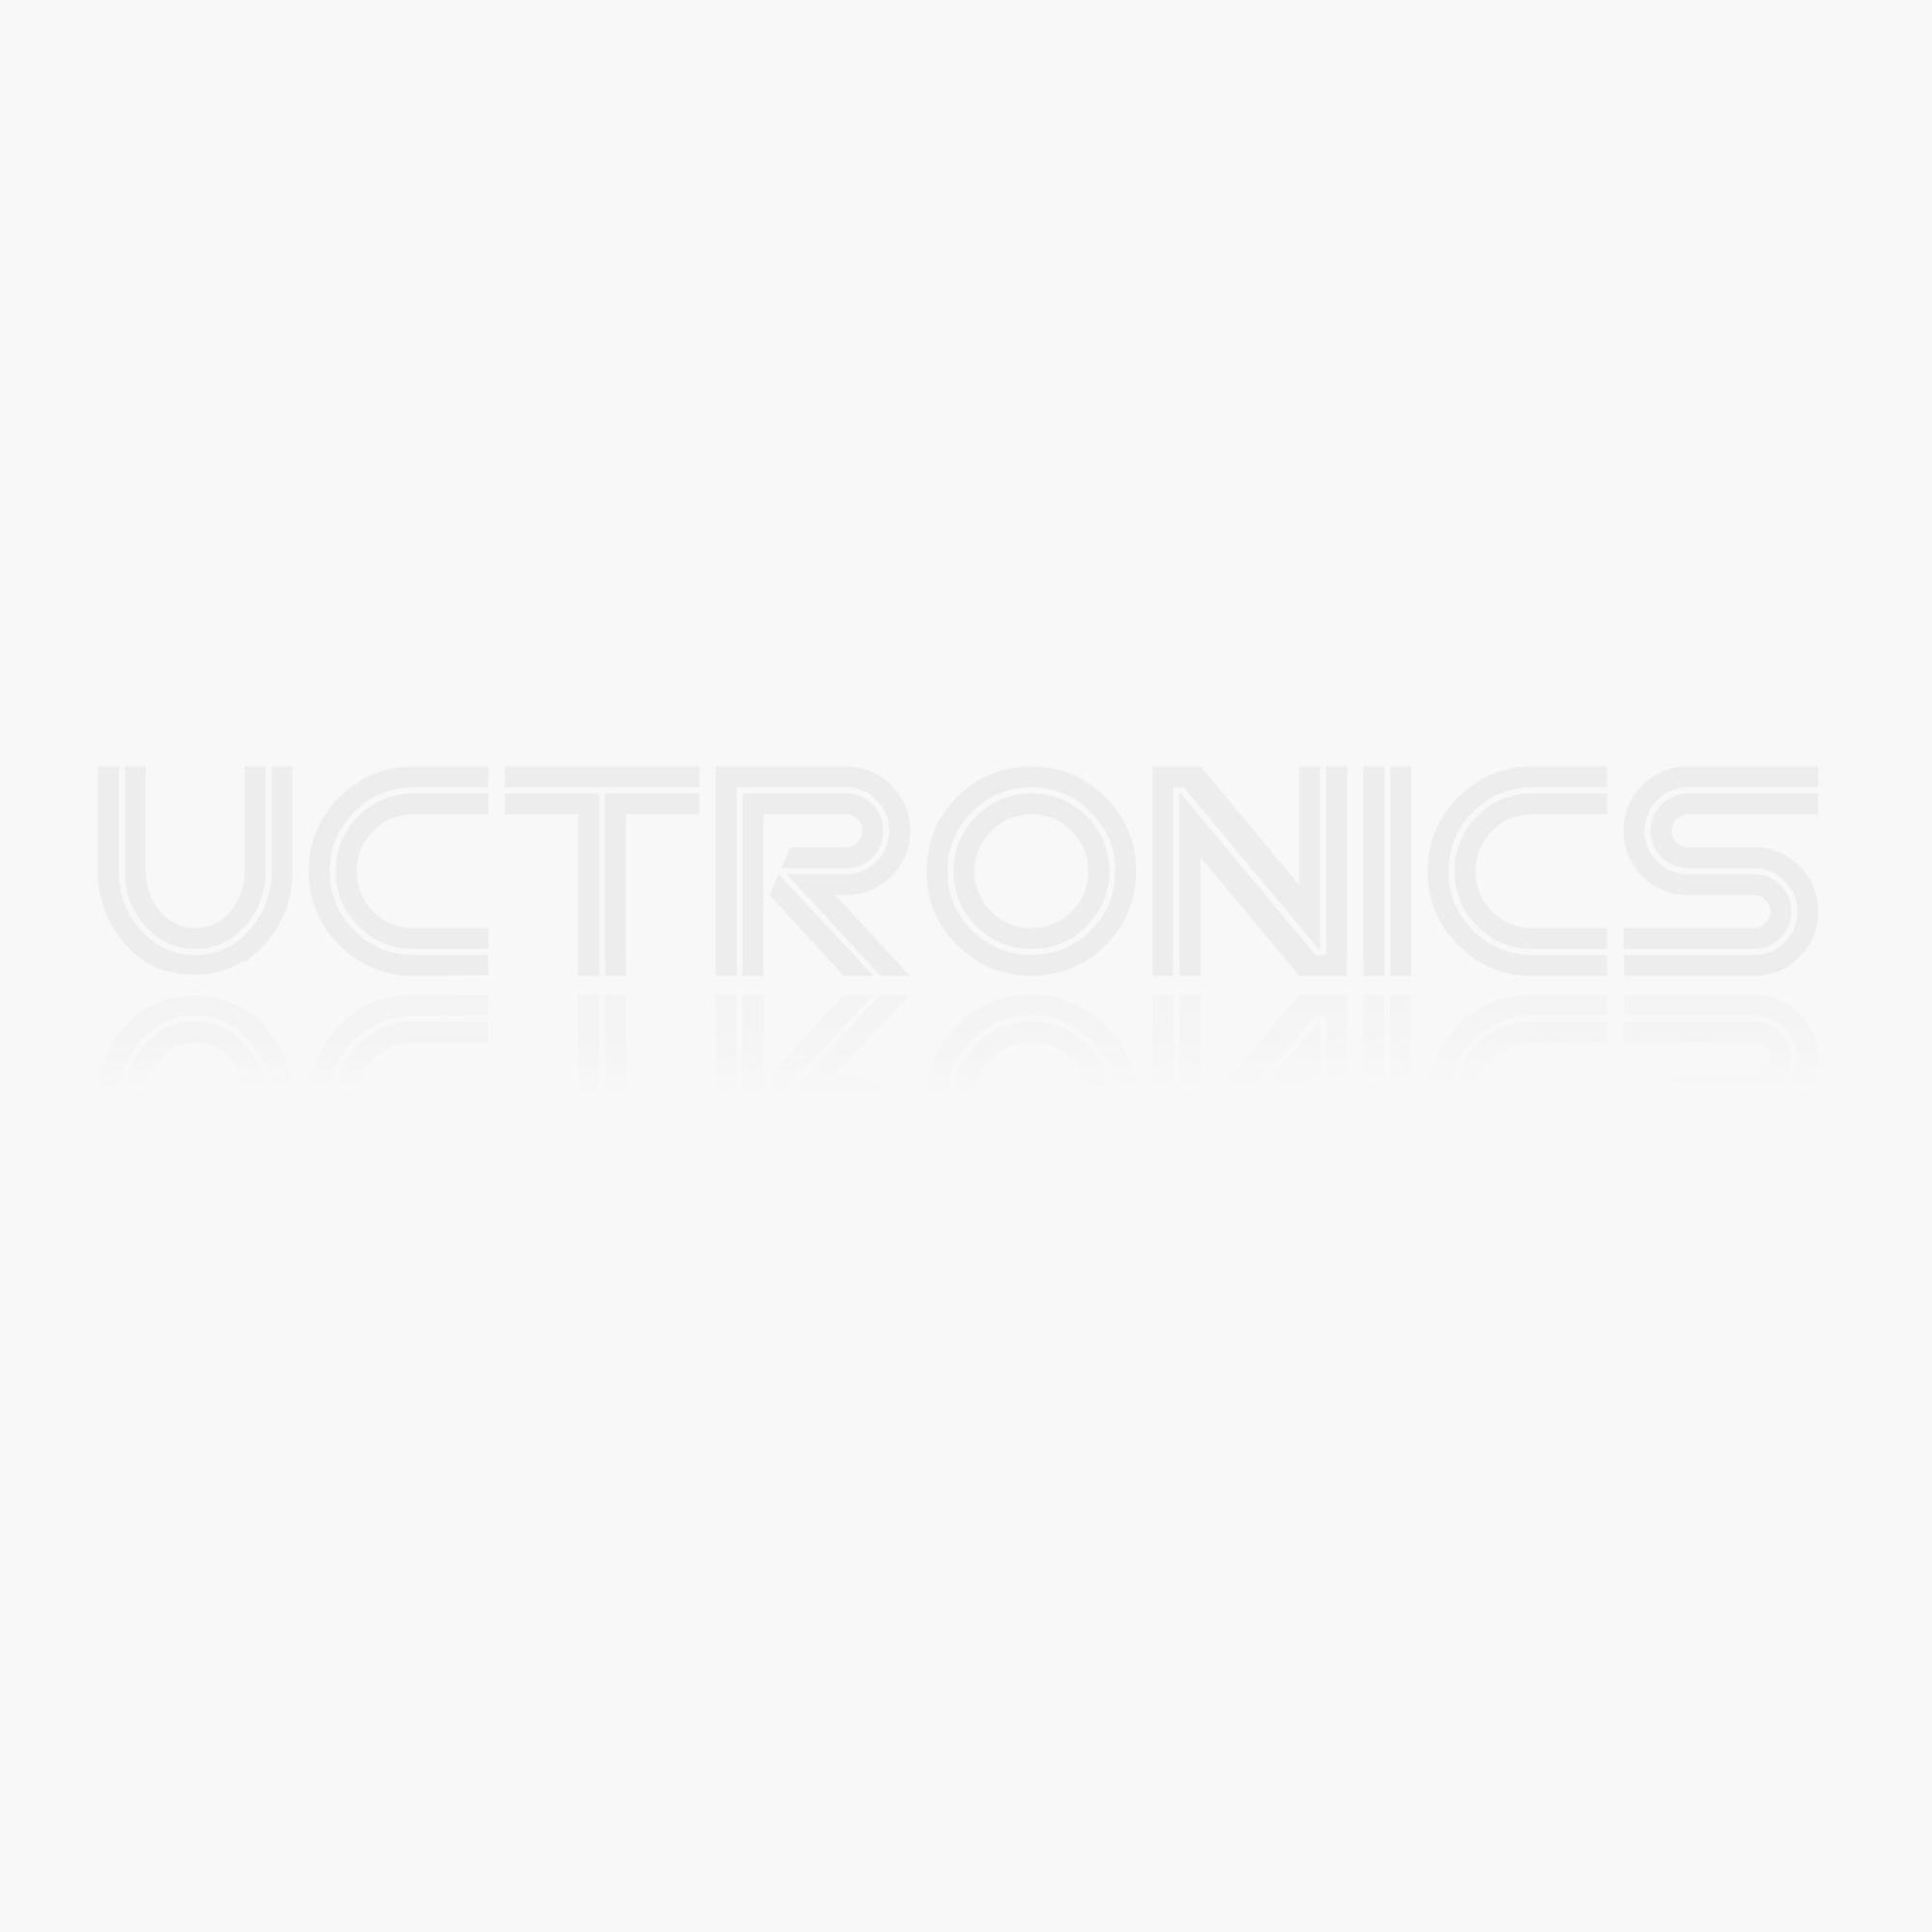 10pcs TJC8-4P 4pin Dupont Header Rightangle Pin Locking Socket 2.54mm Pitch